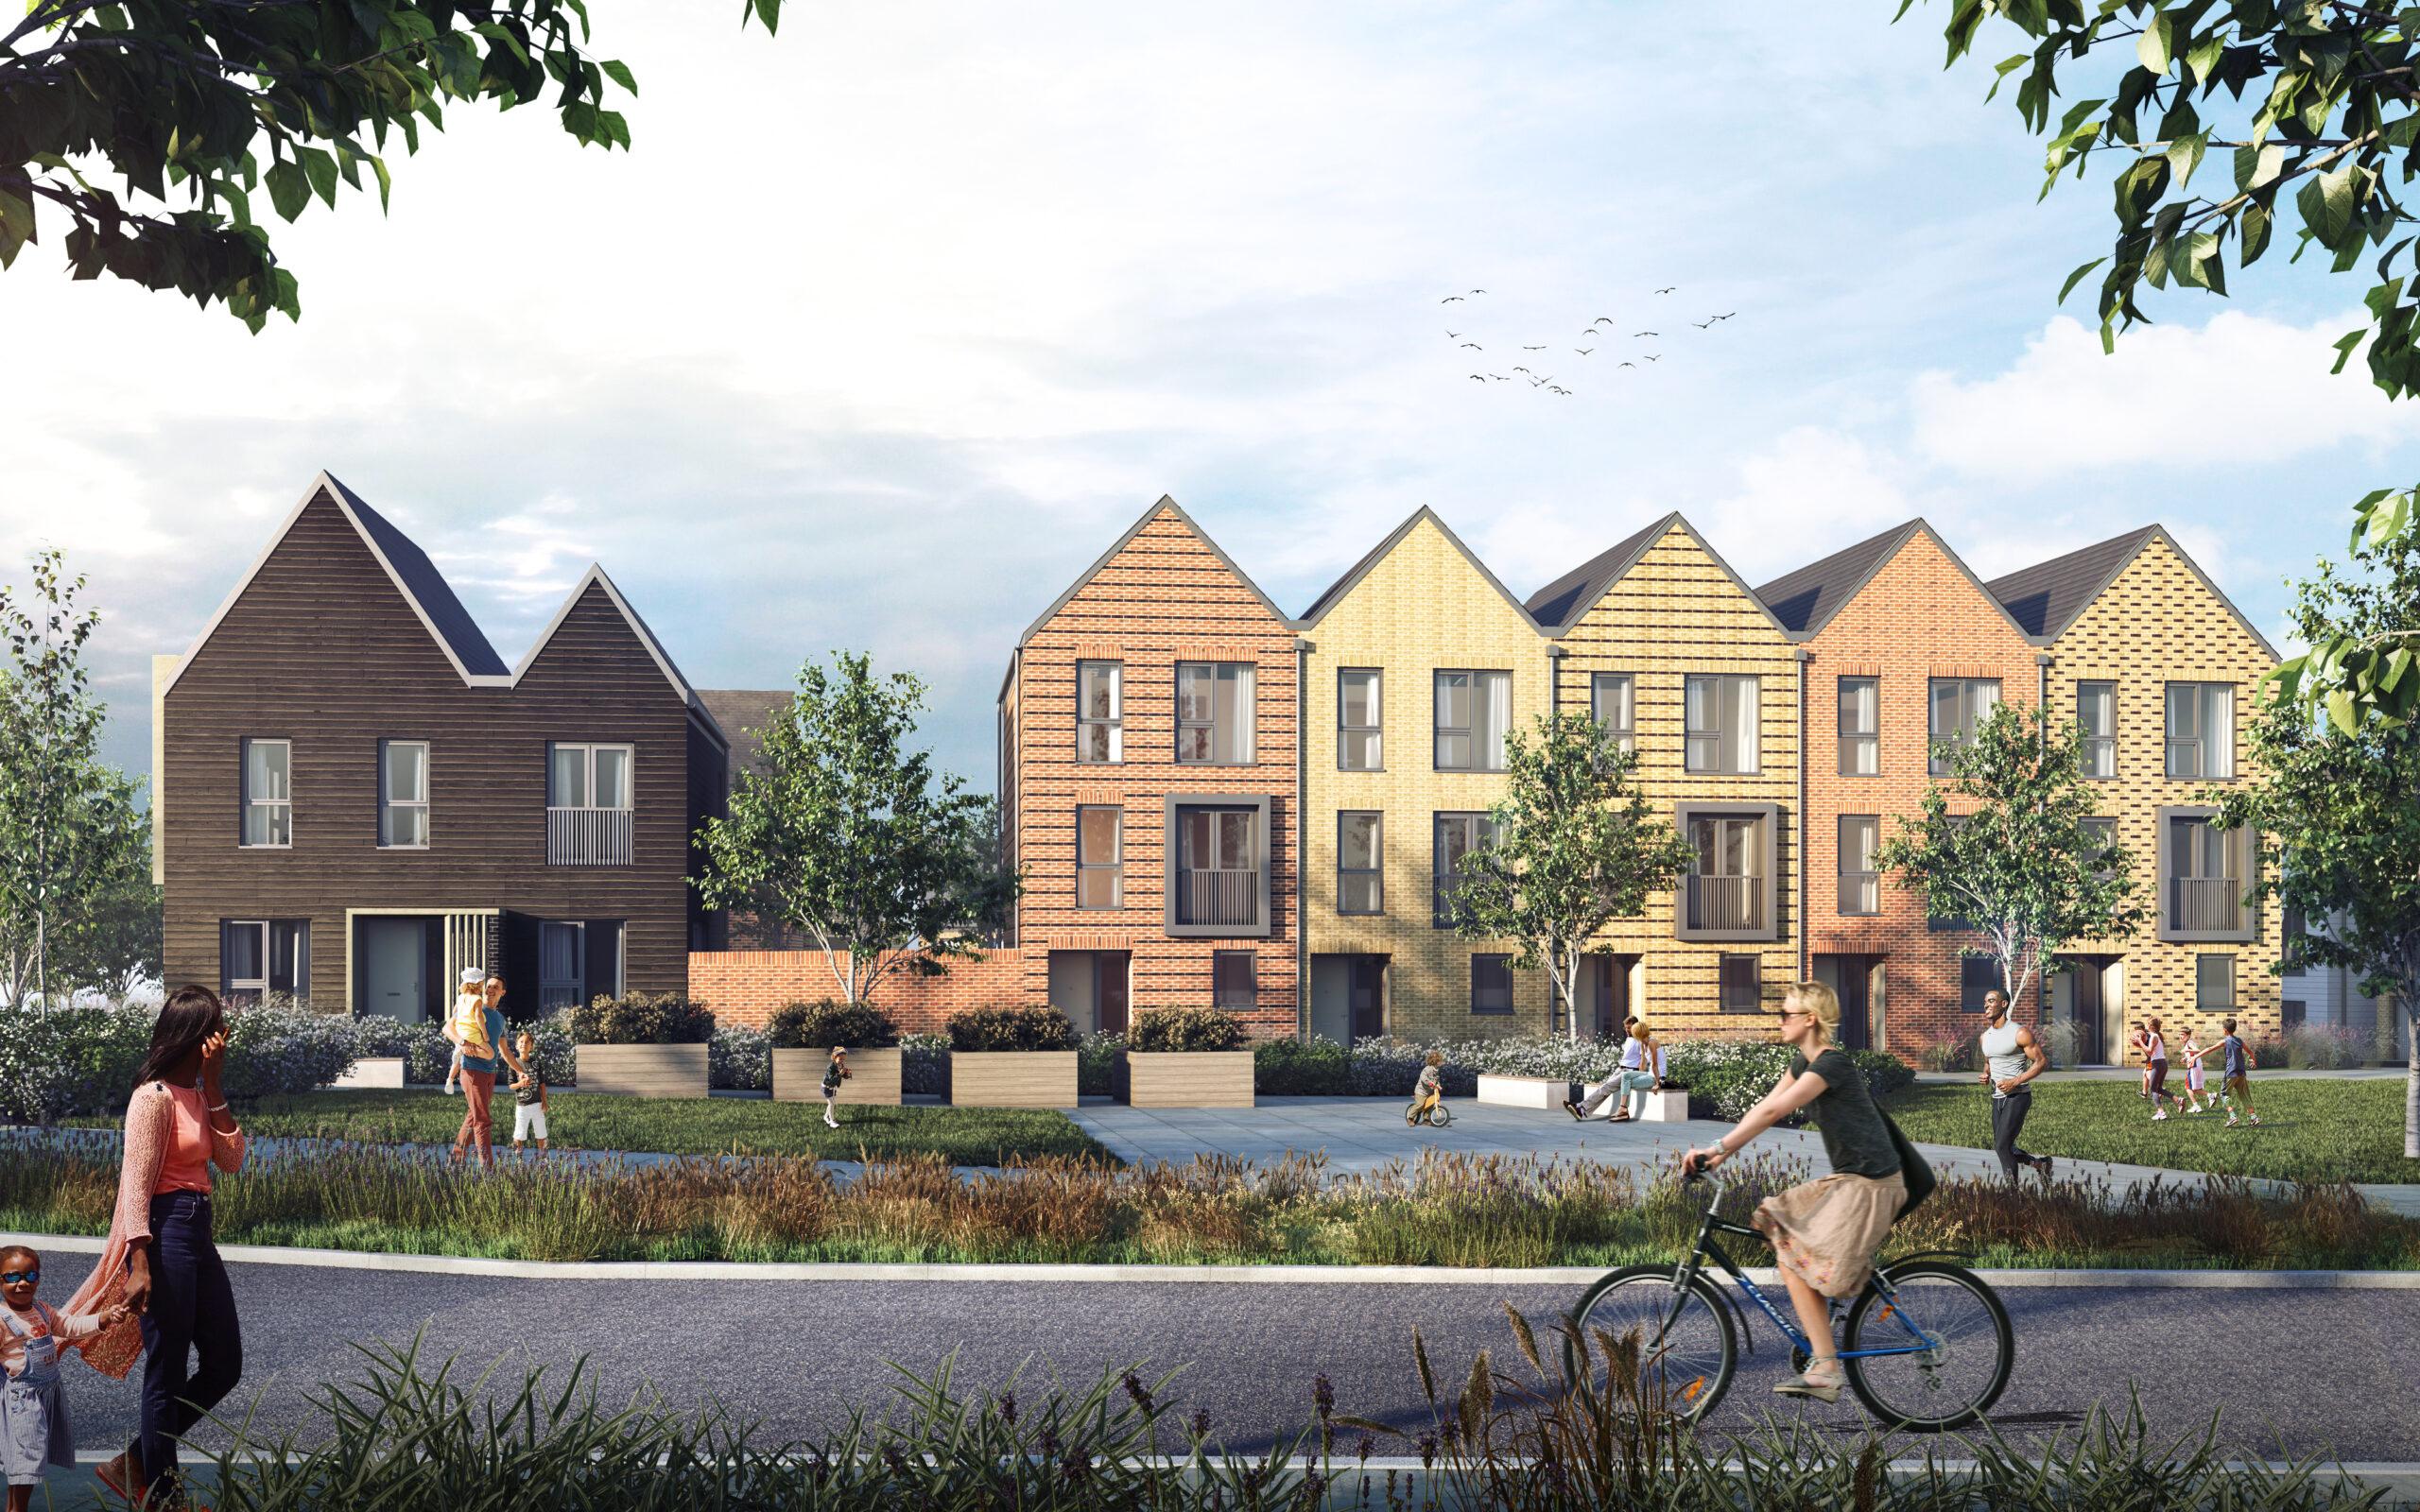 Let's talk about our latest new homes development Alkerden Gateway, a unique custom build at Ebbsfleet Garden City.